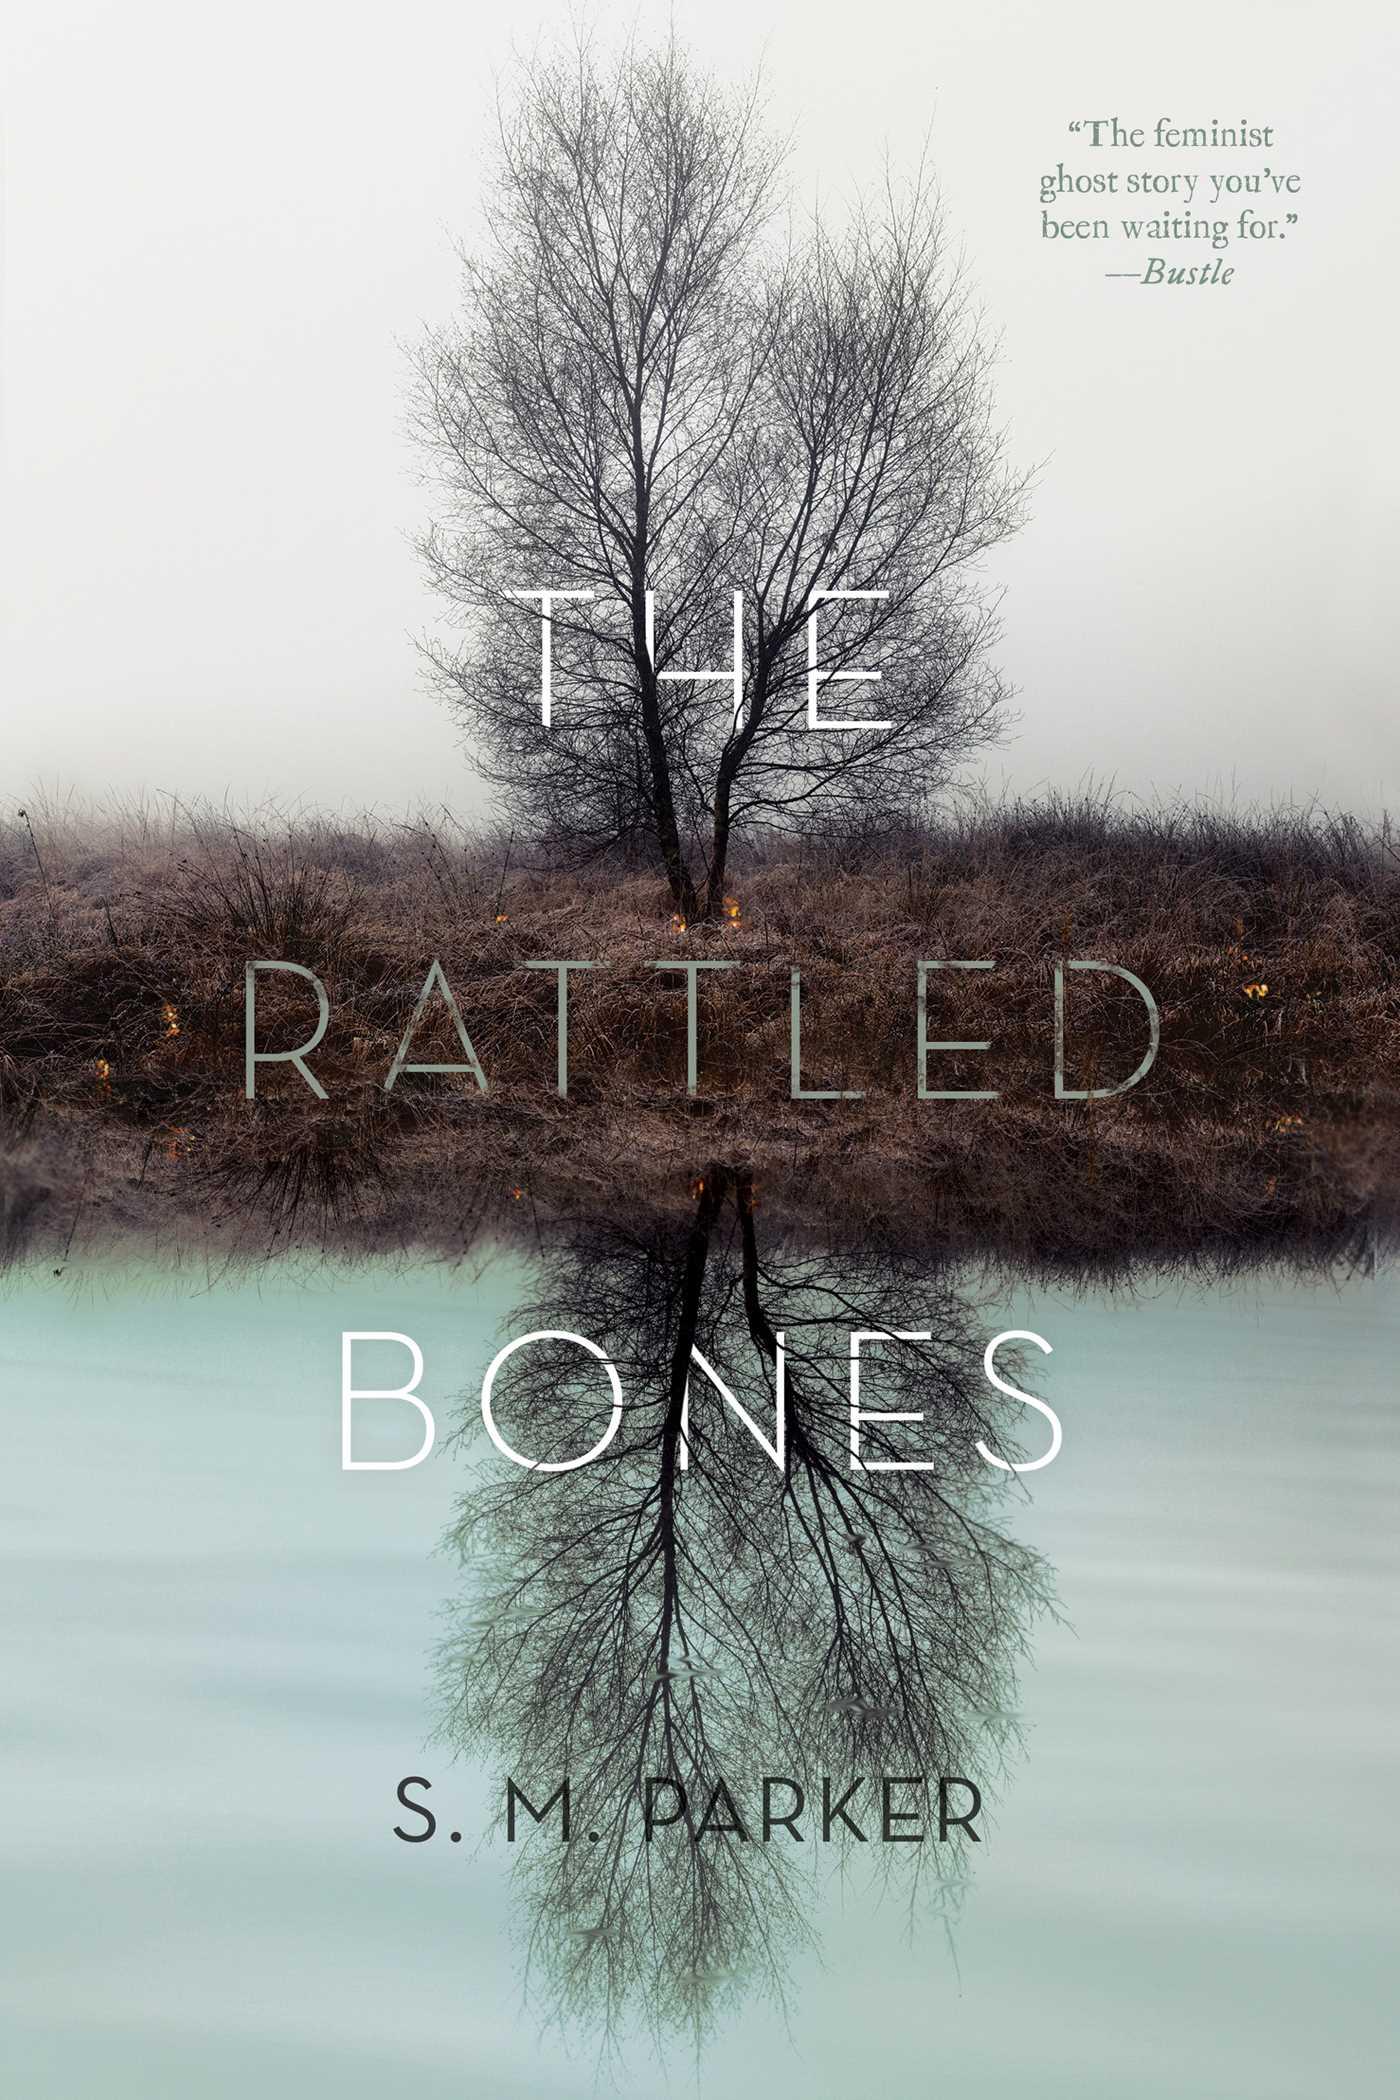 The rattled bones 9781481482066 hr